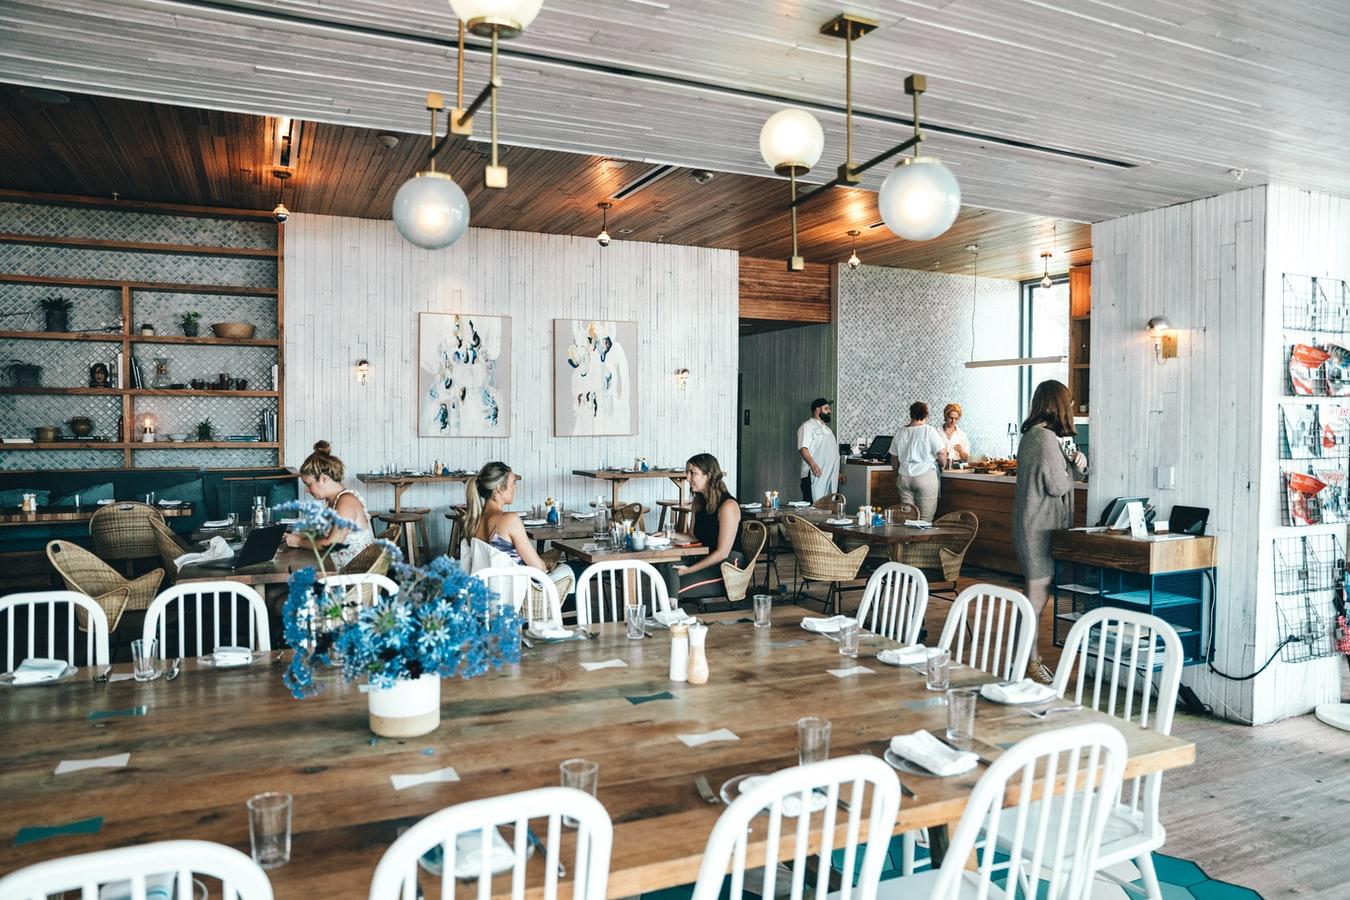 Italian Restaurants in Sacramento You Need to Visit